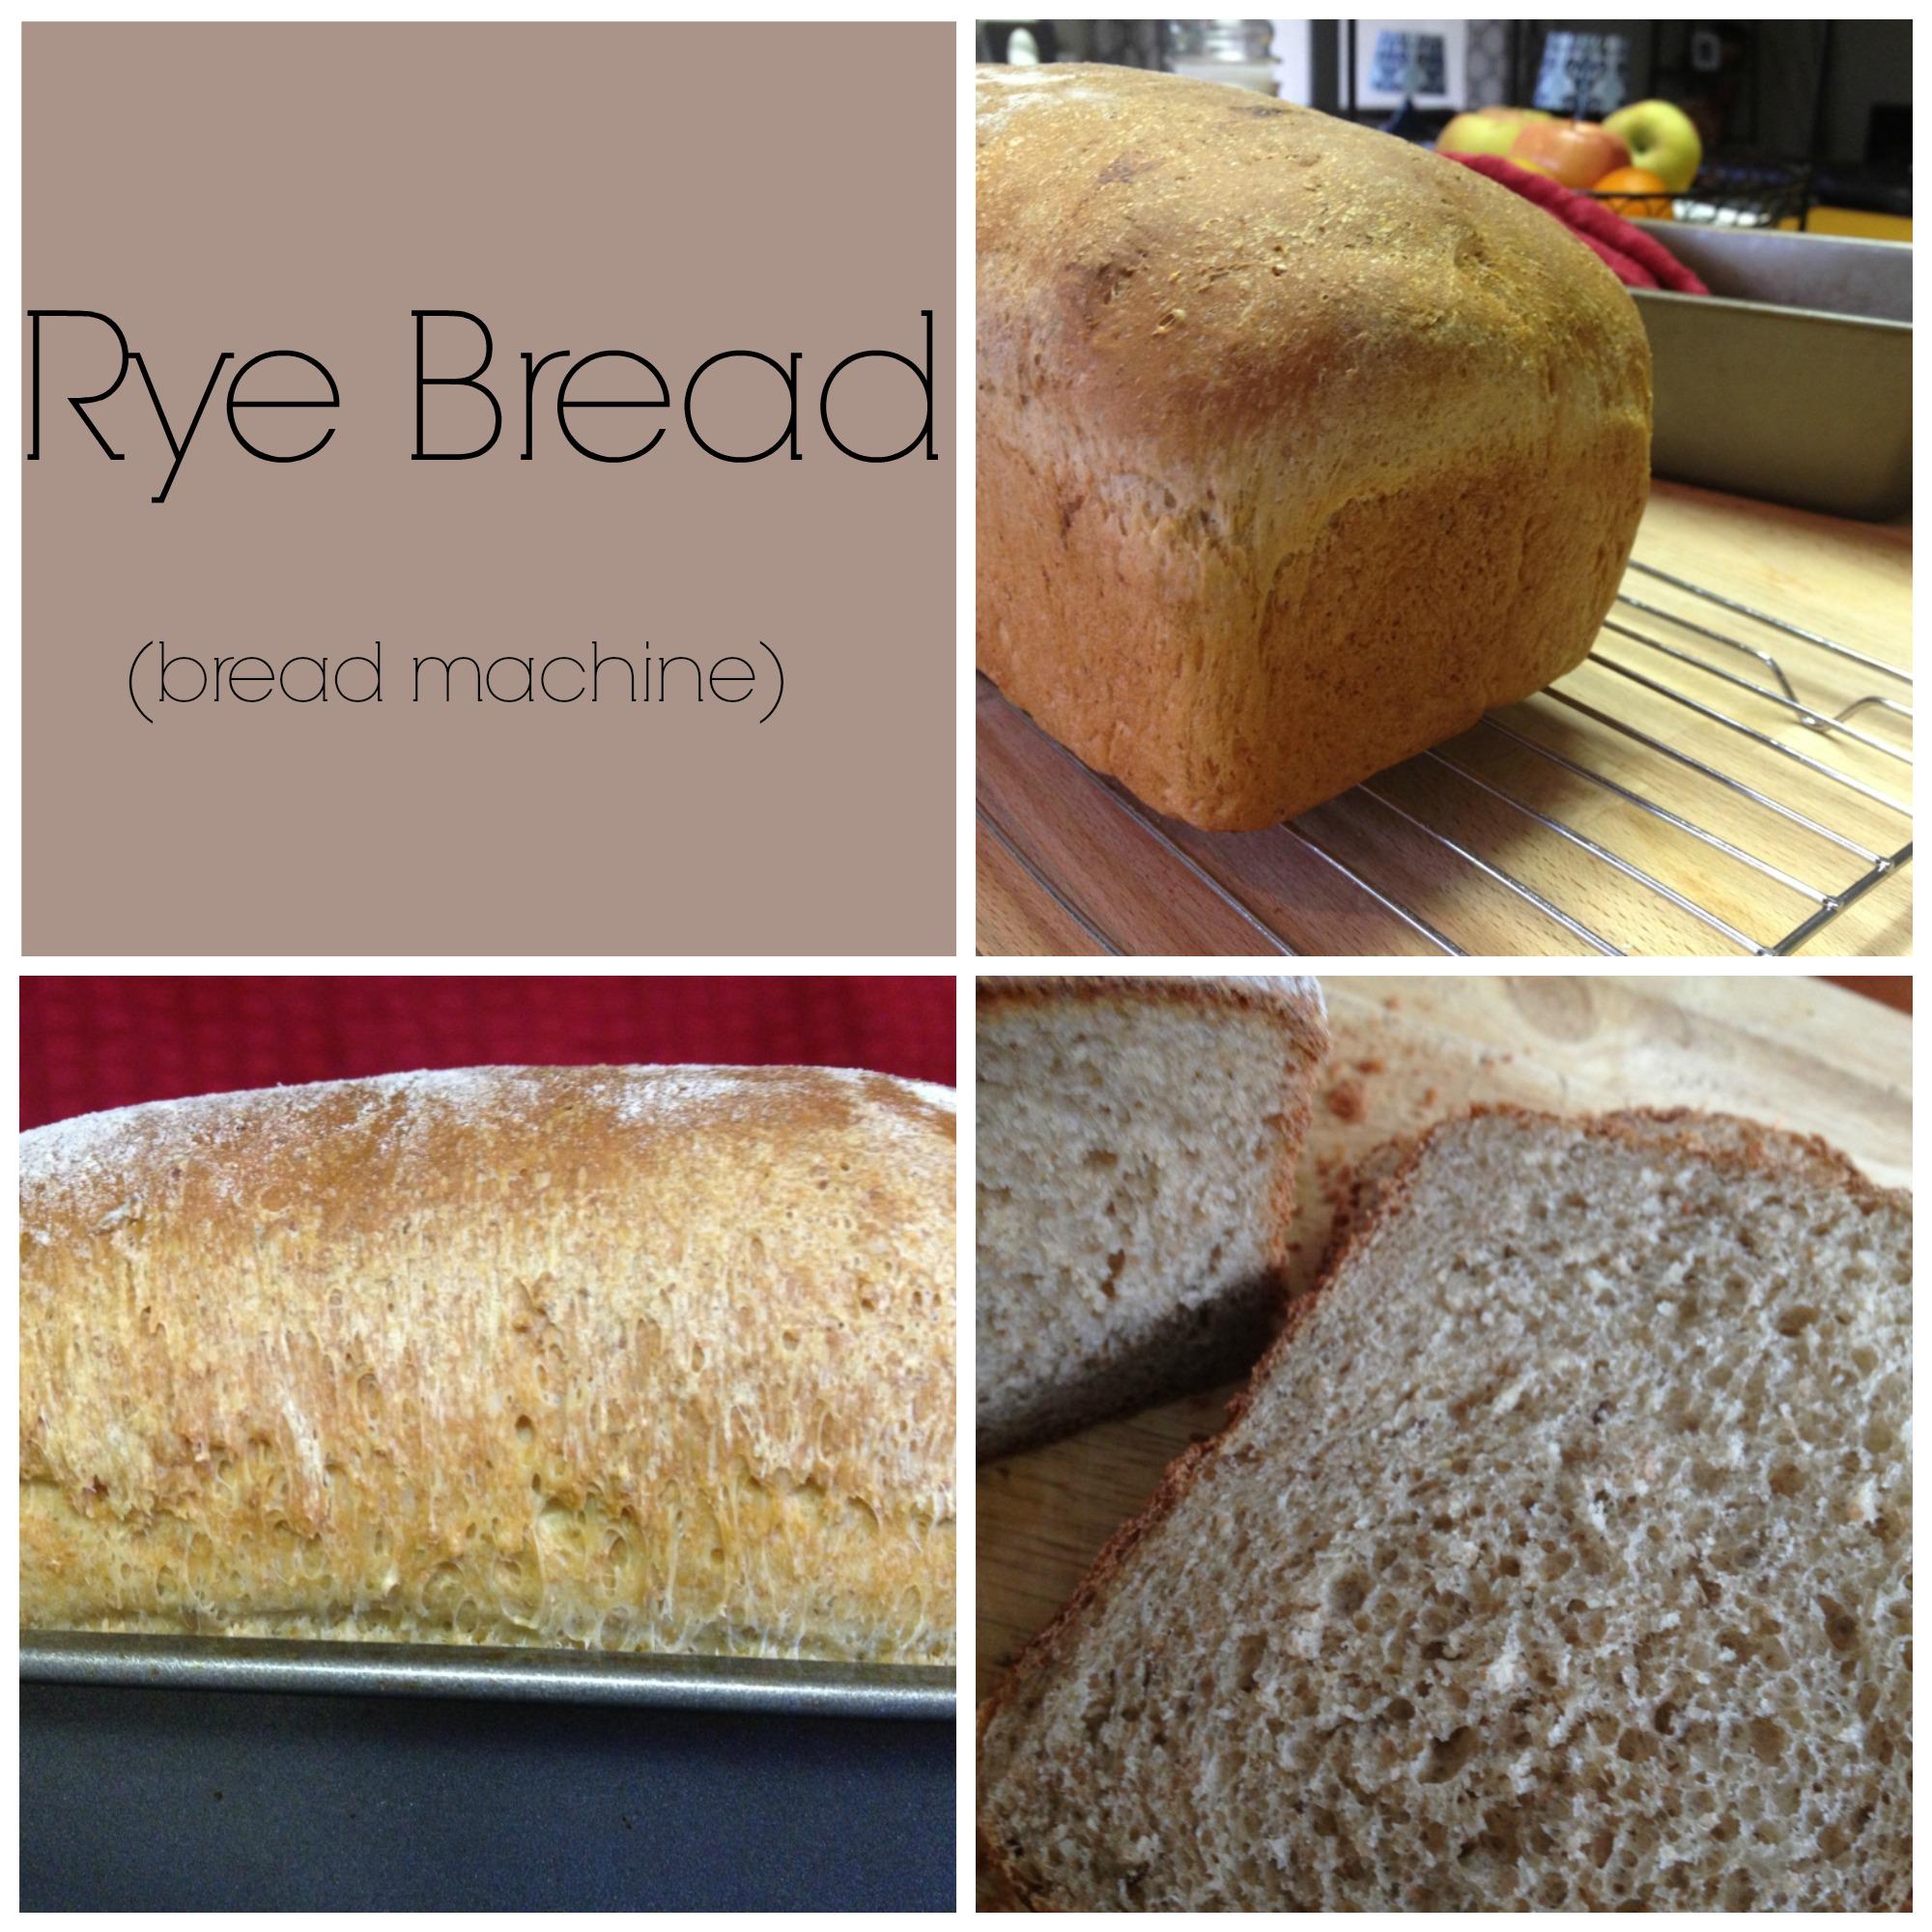 Rye bread (bread machine recipe) - Mila's Milieu